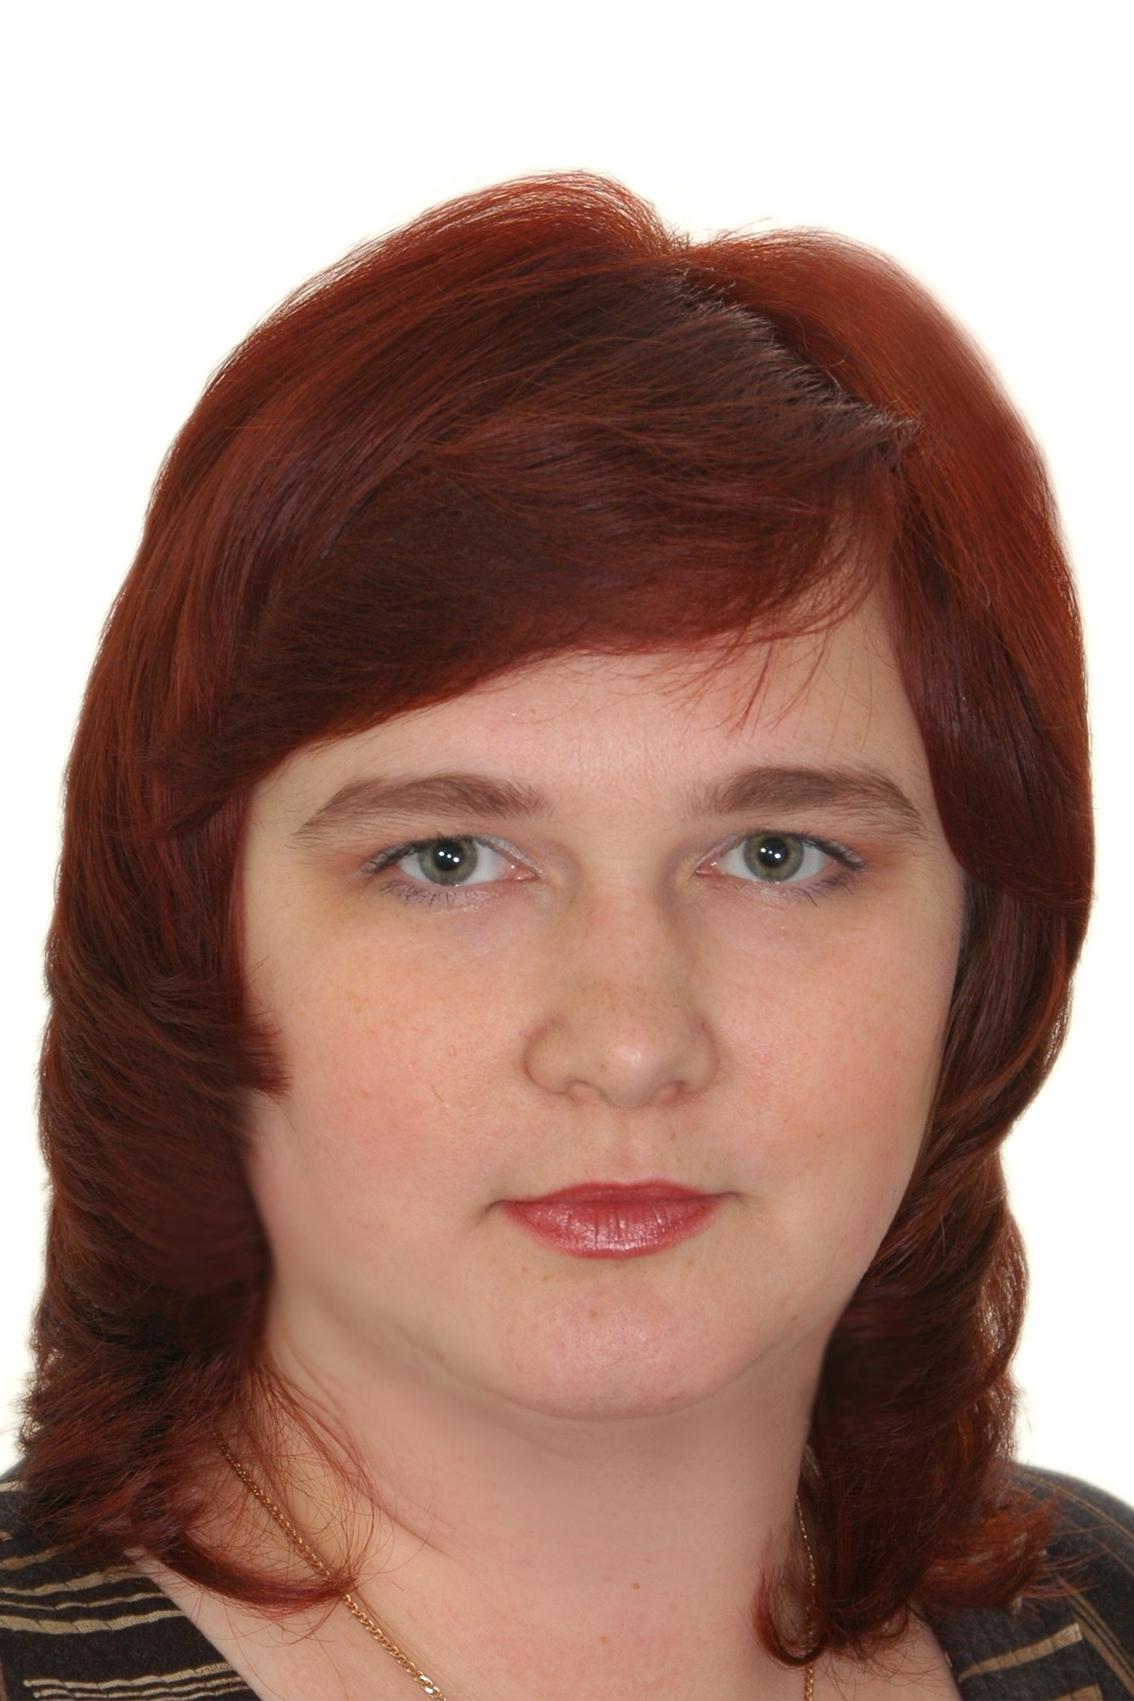 Емельянова Екатерина Александровна